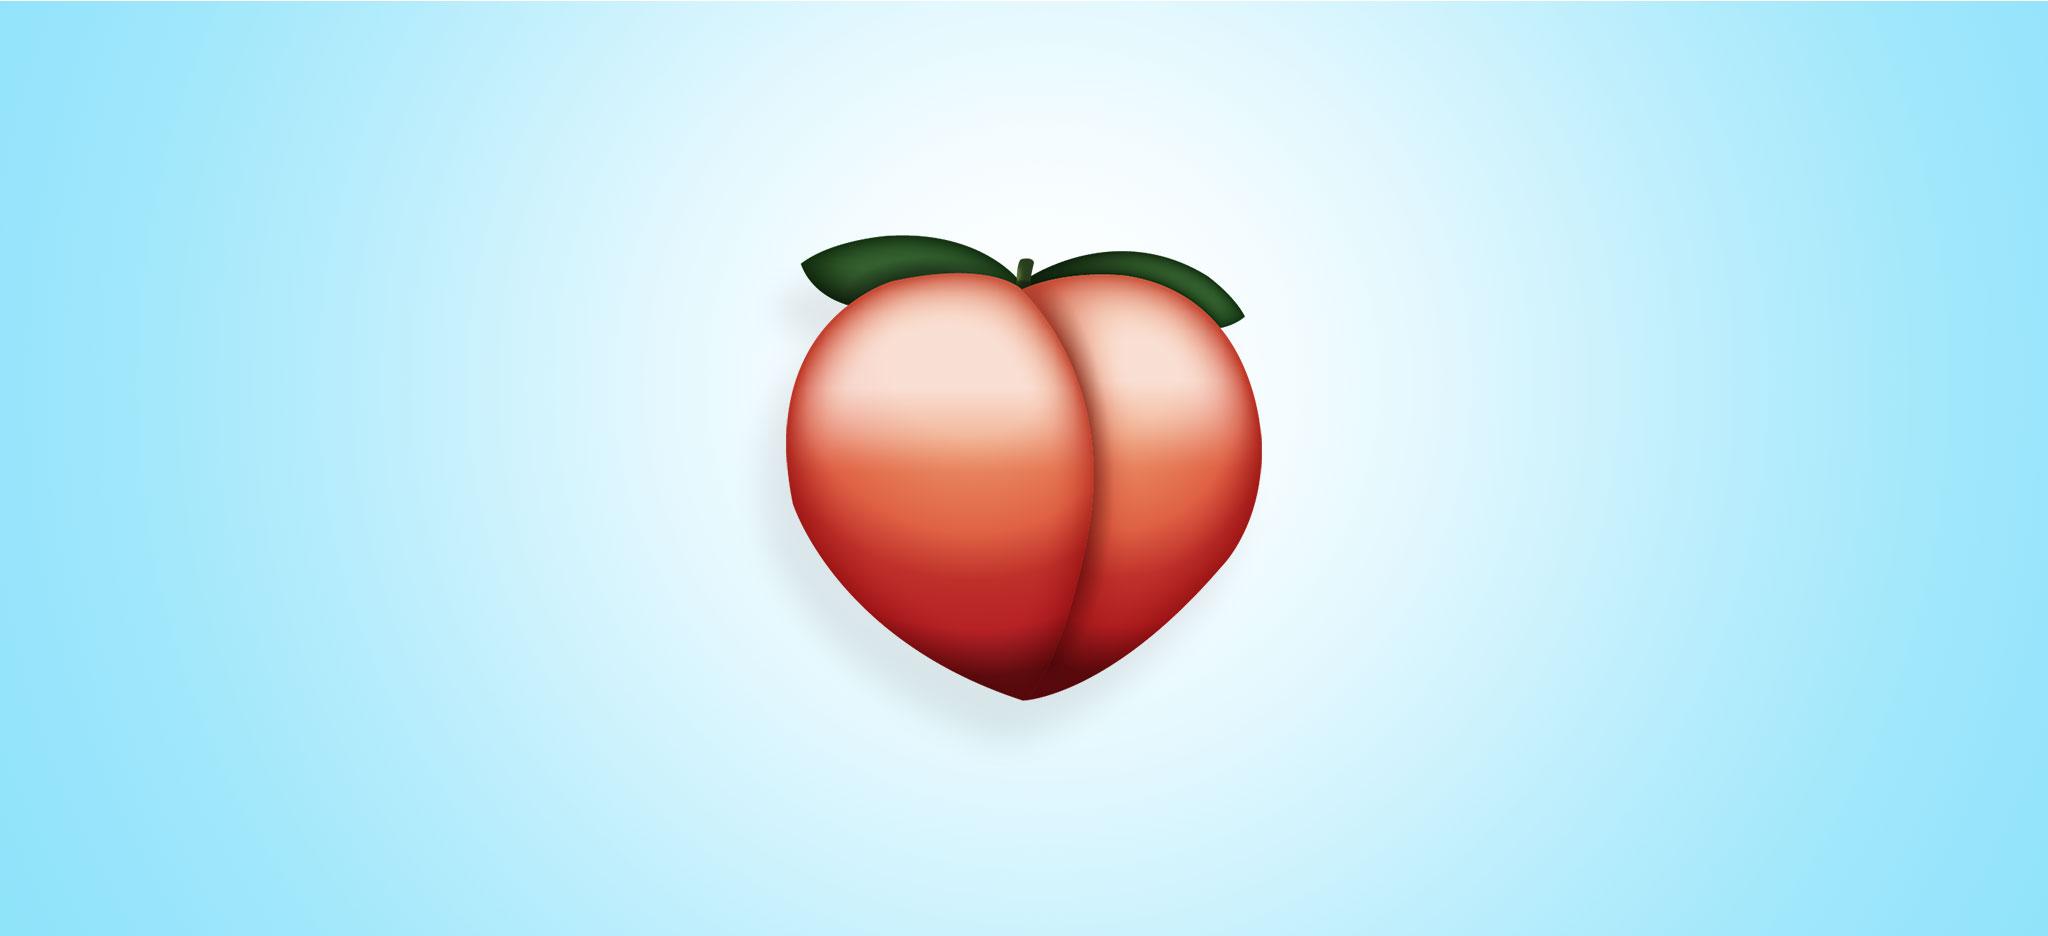 booty sexting emoji